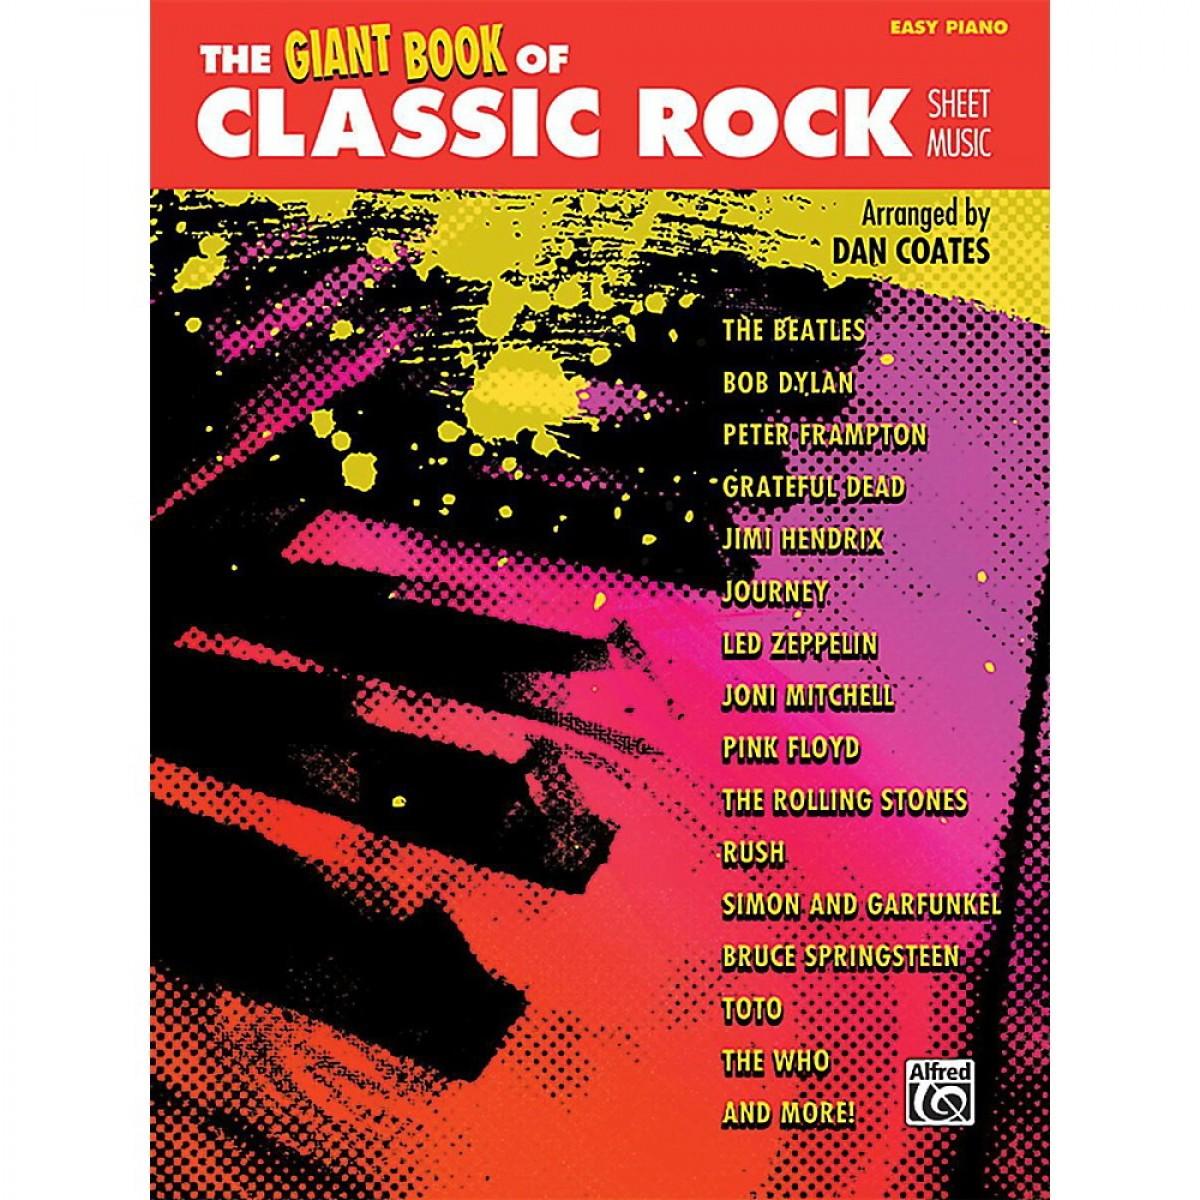 Alfred Giant Book of Classic Rock Sheet Music - The School Locker